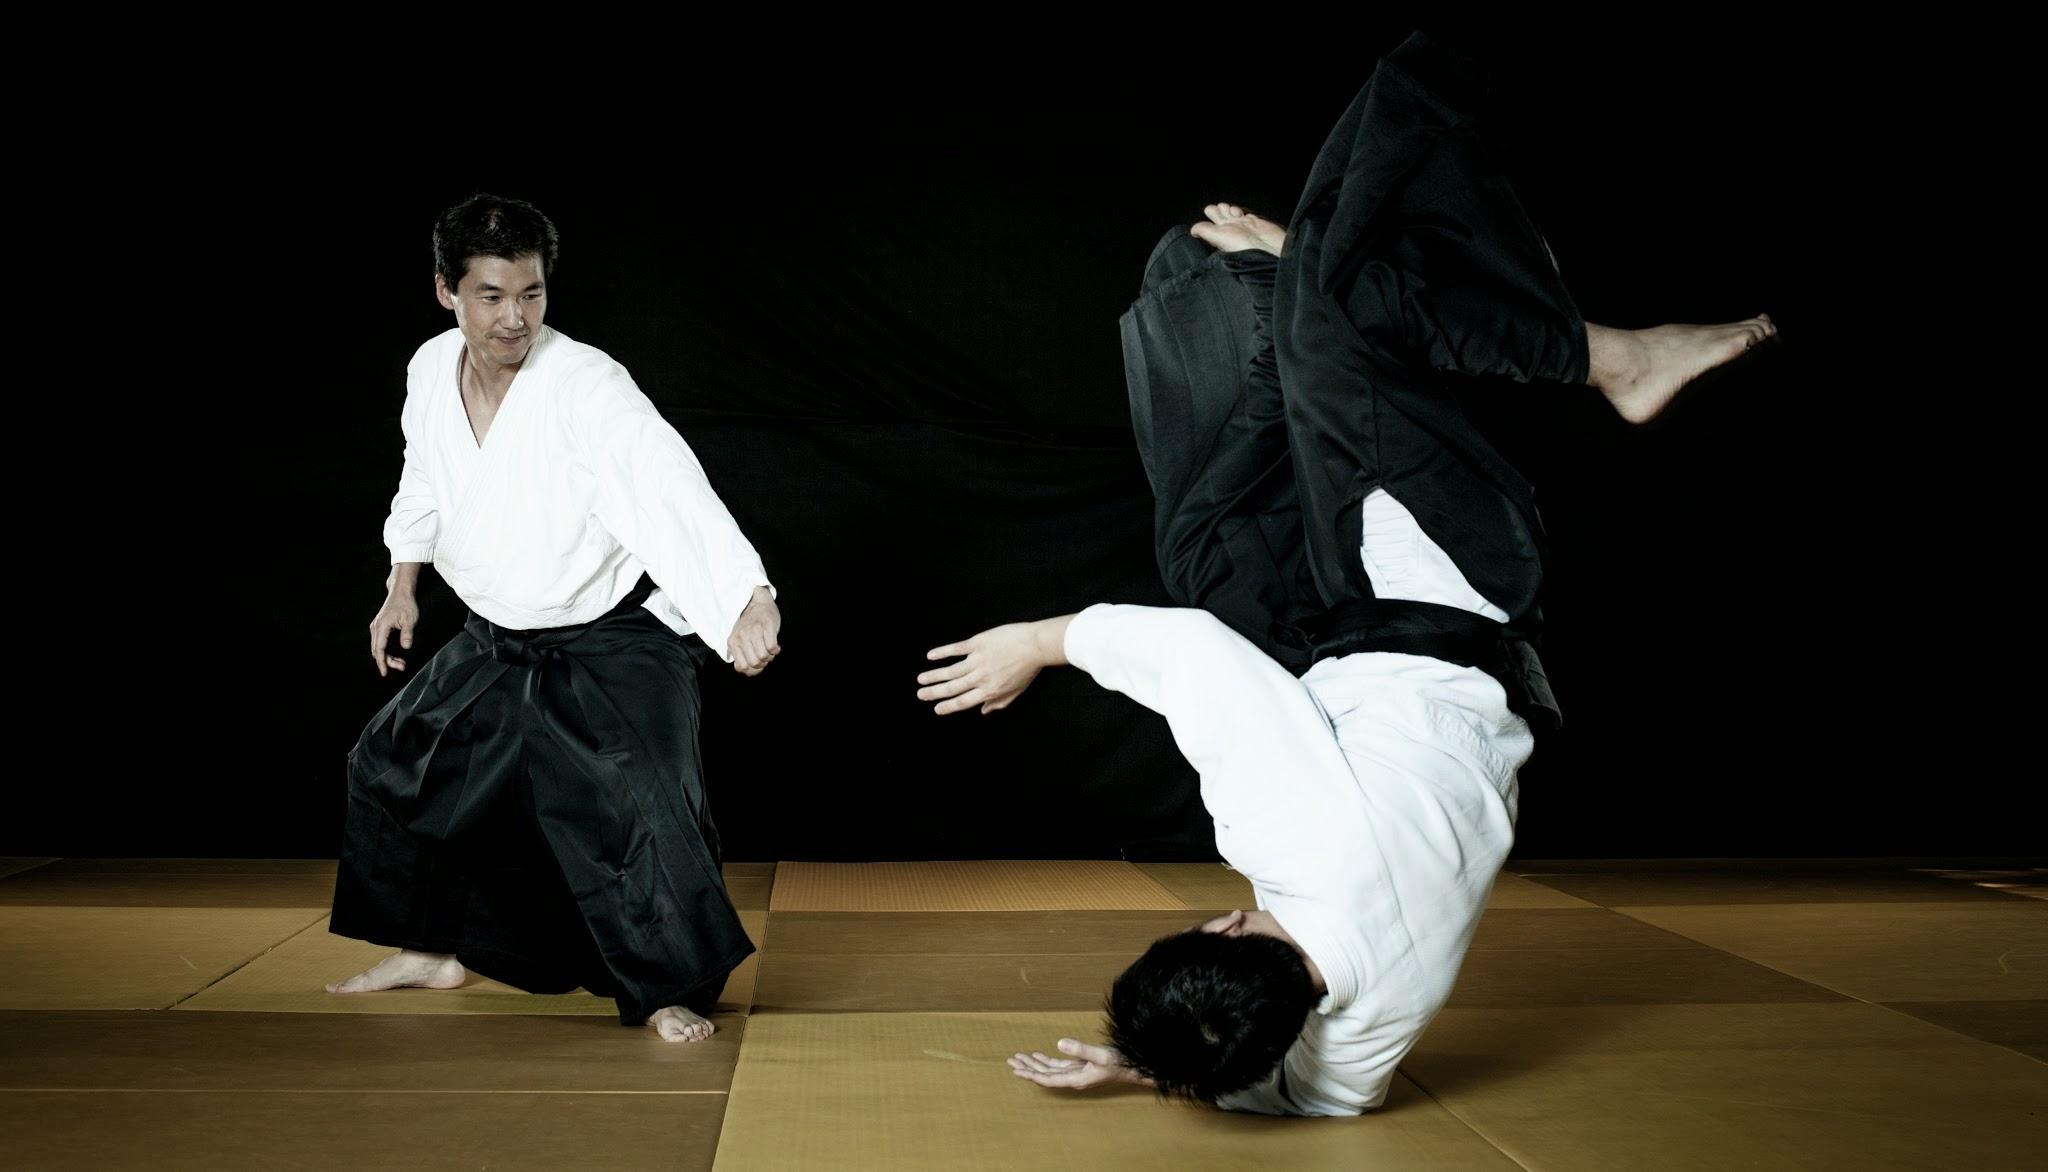 Aikido_Mar_2014-1141.jpg